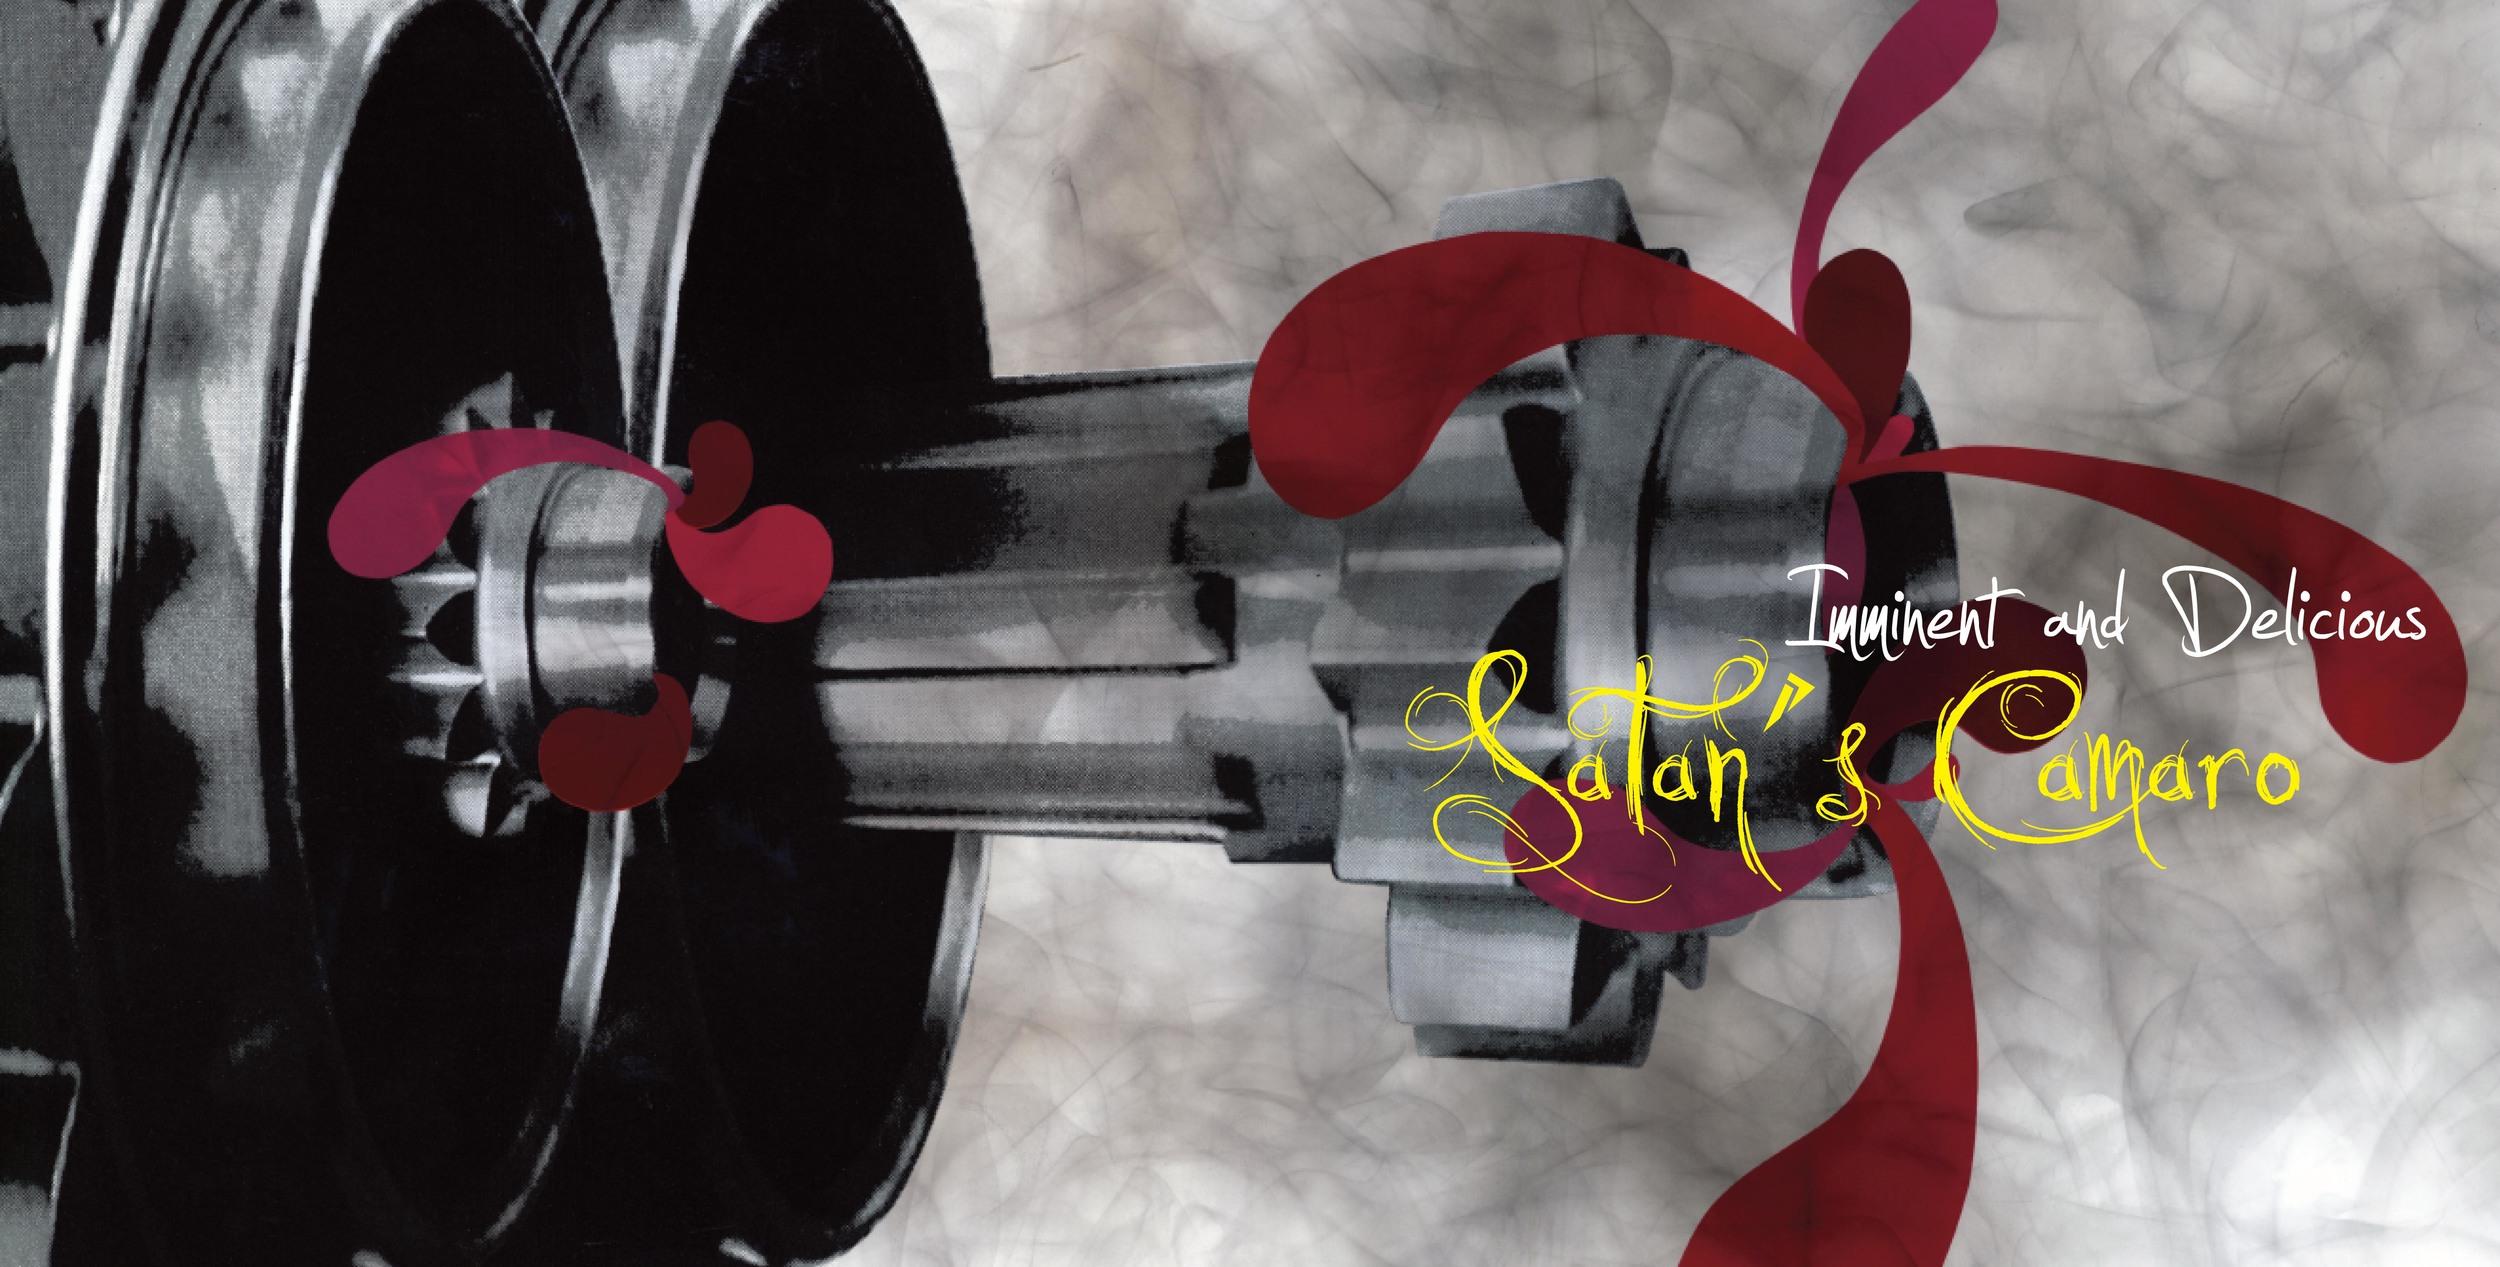 Satan's Carmaro catalogue cover-1.jpg